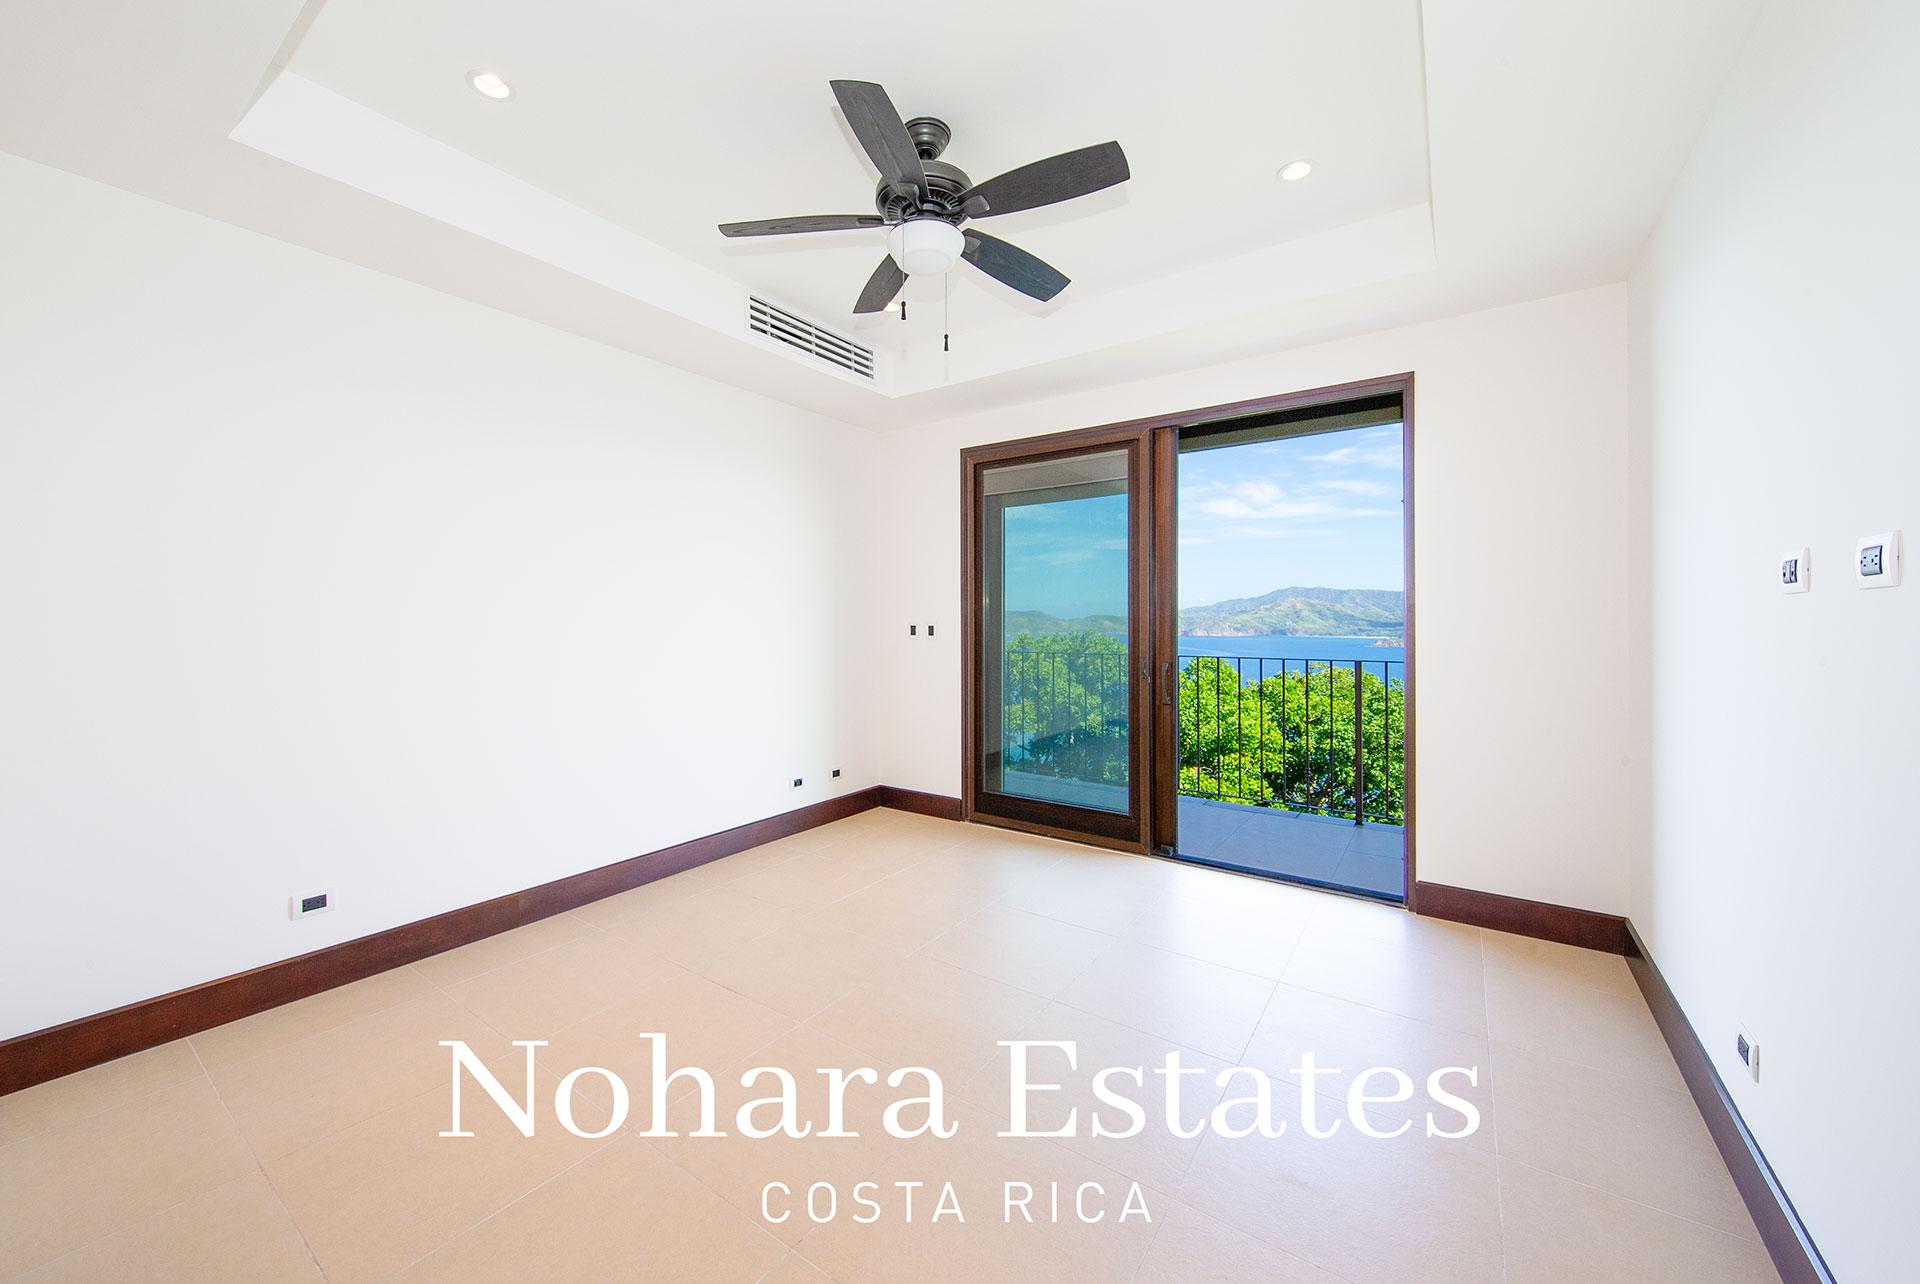 Nohara Estates Costa Rica 360 Esplendor Pacifico Playa Flamingo Penthouse 5